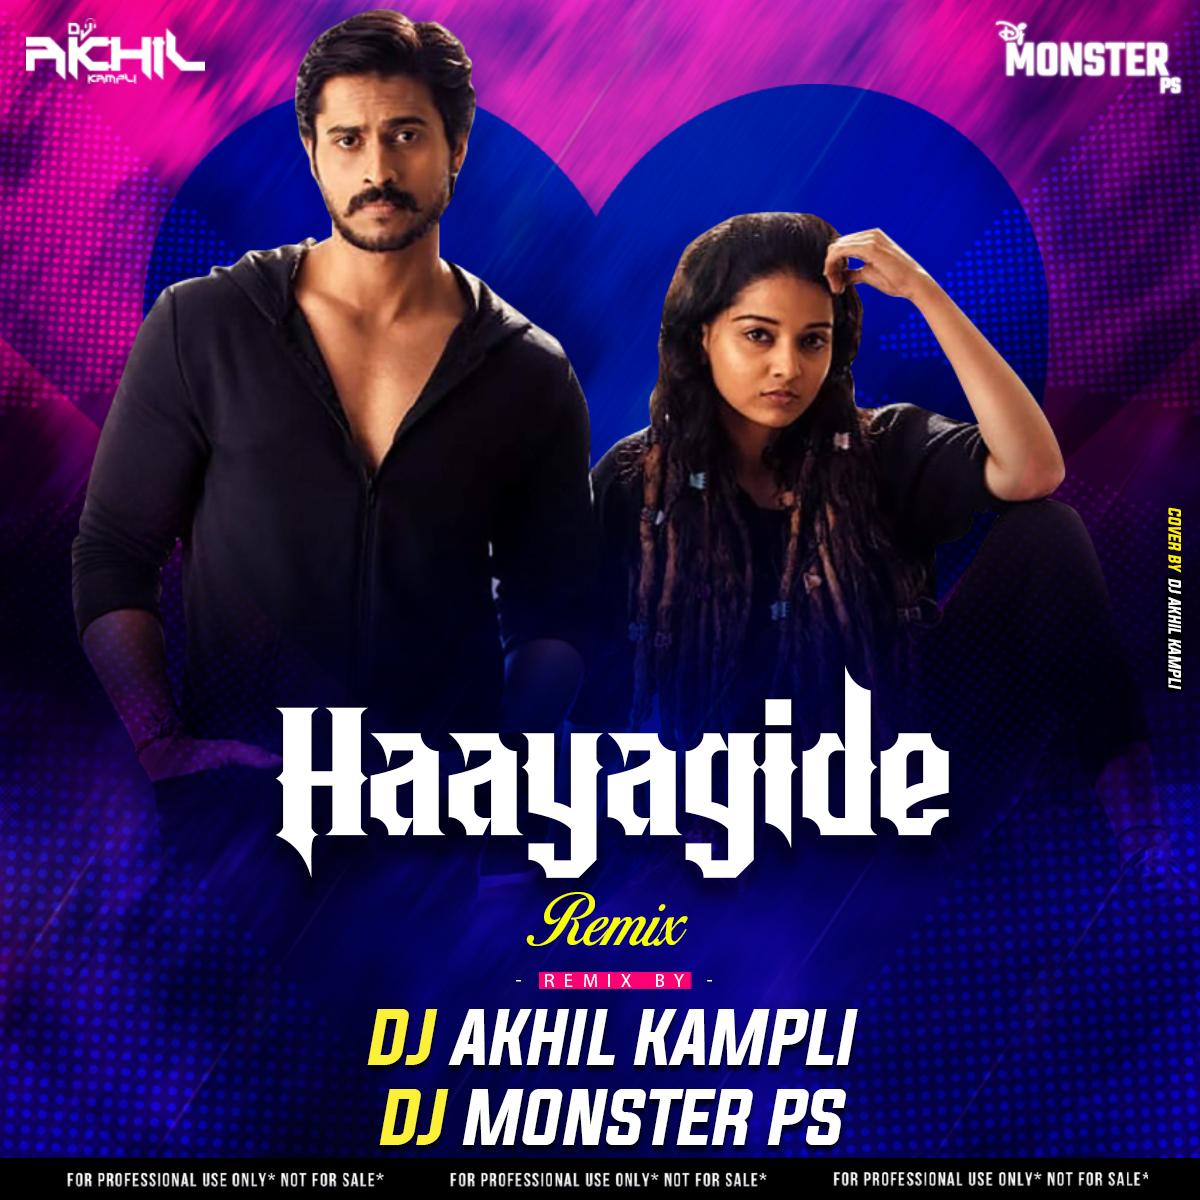 Haayagide Remix Dj Monster PS Dj Akhil Kampli